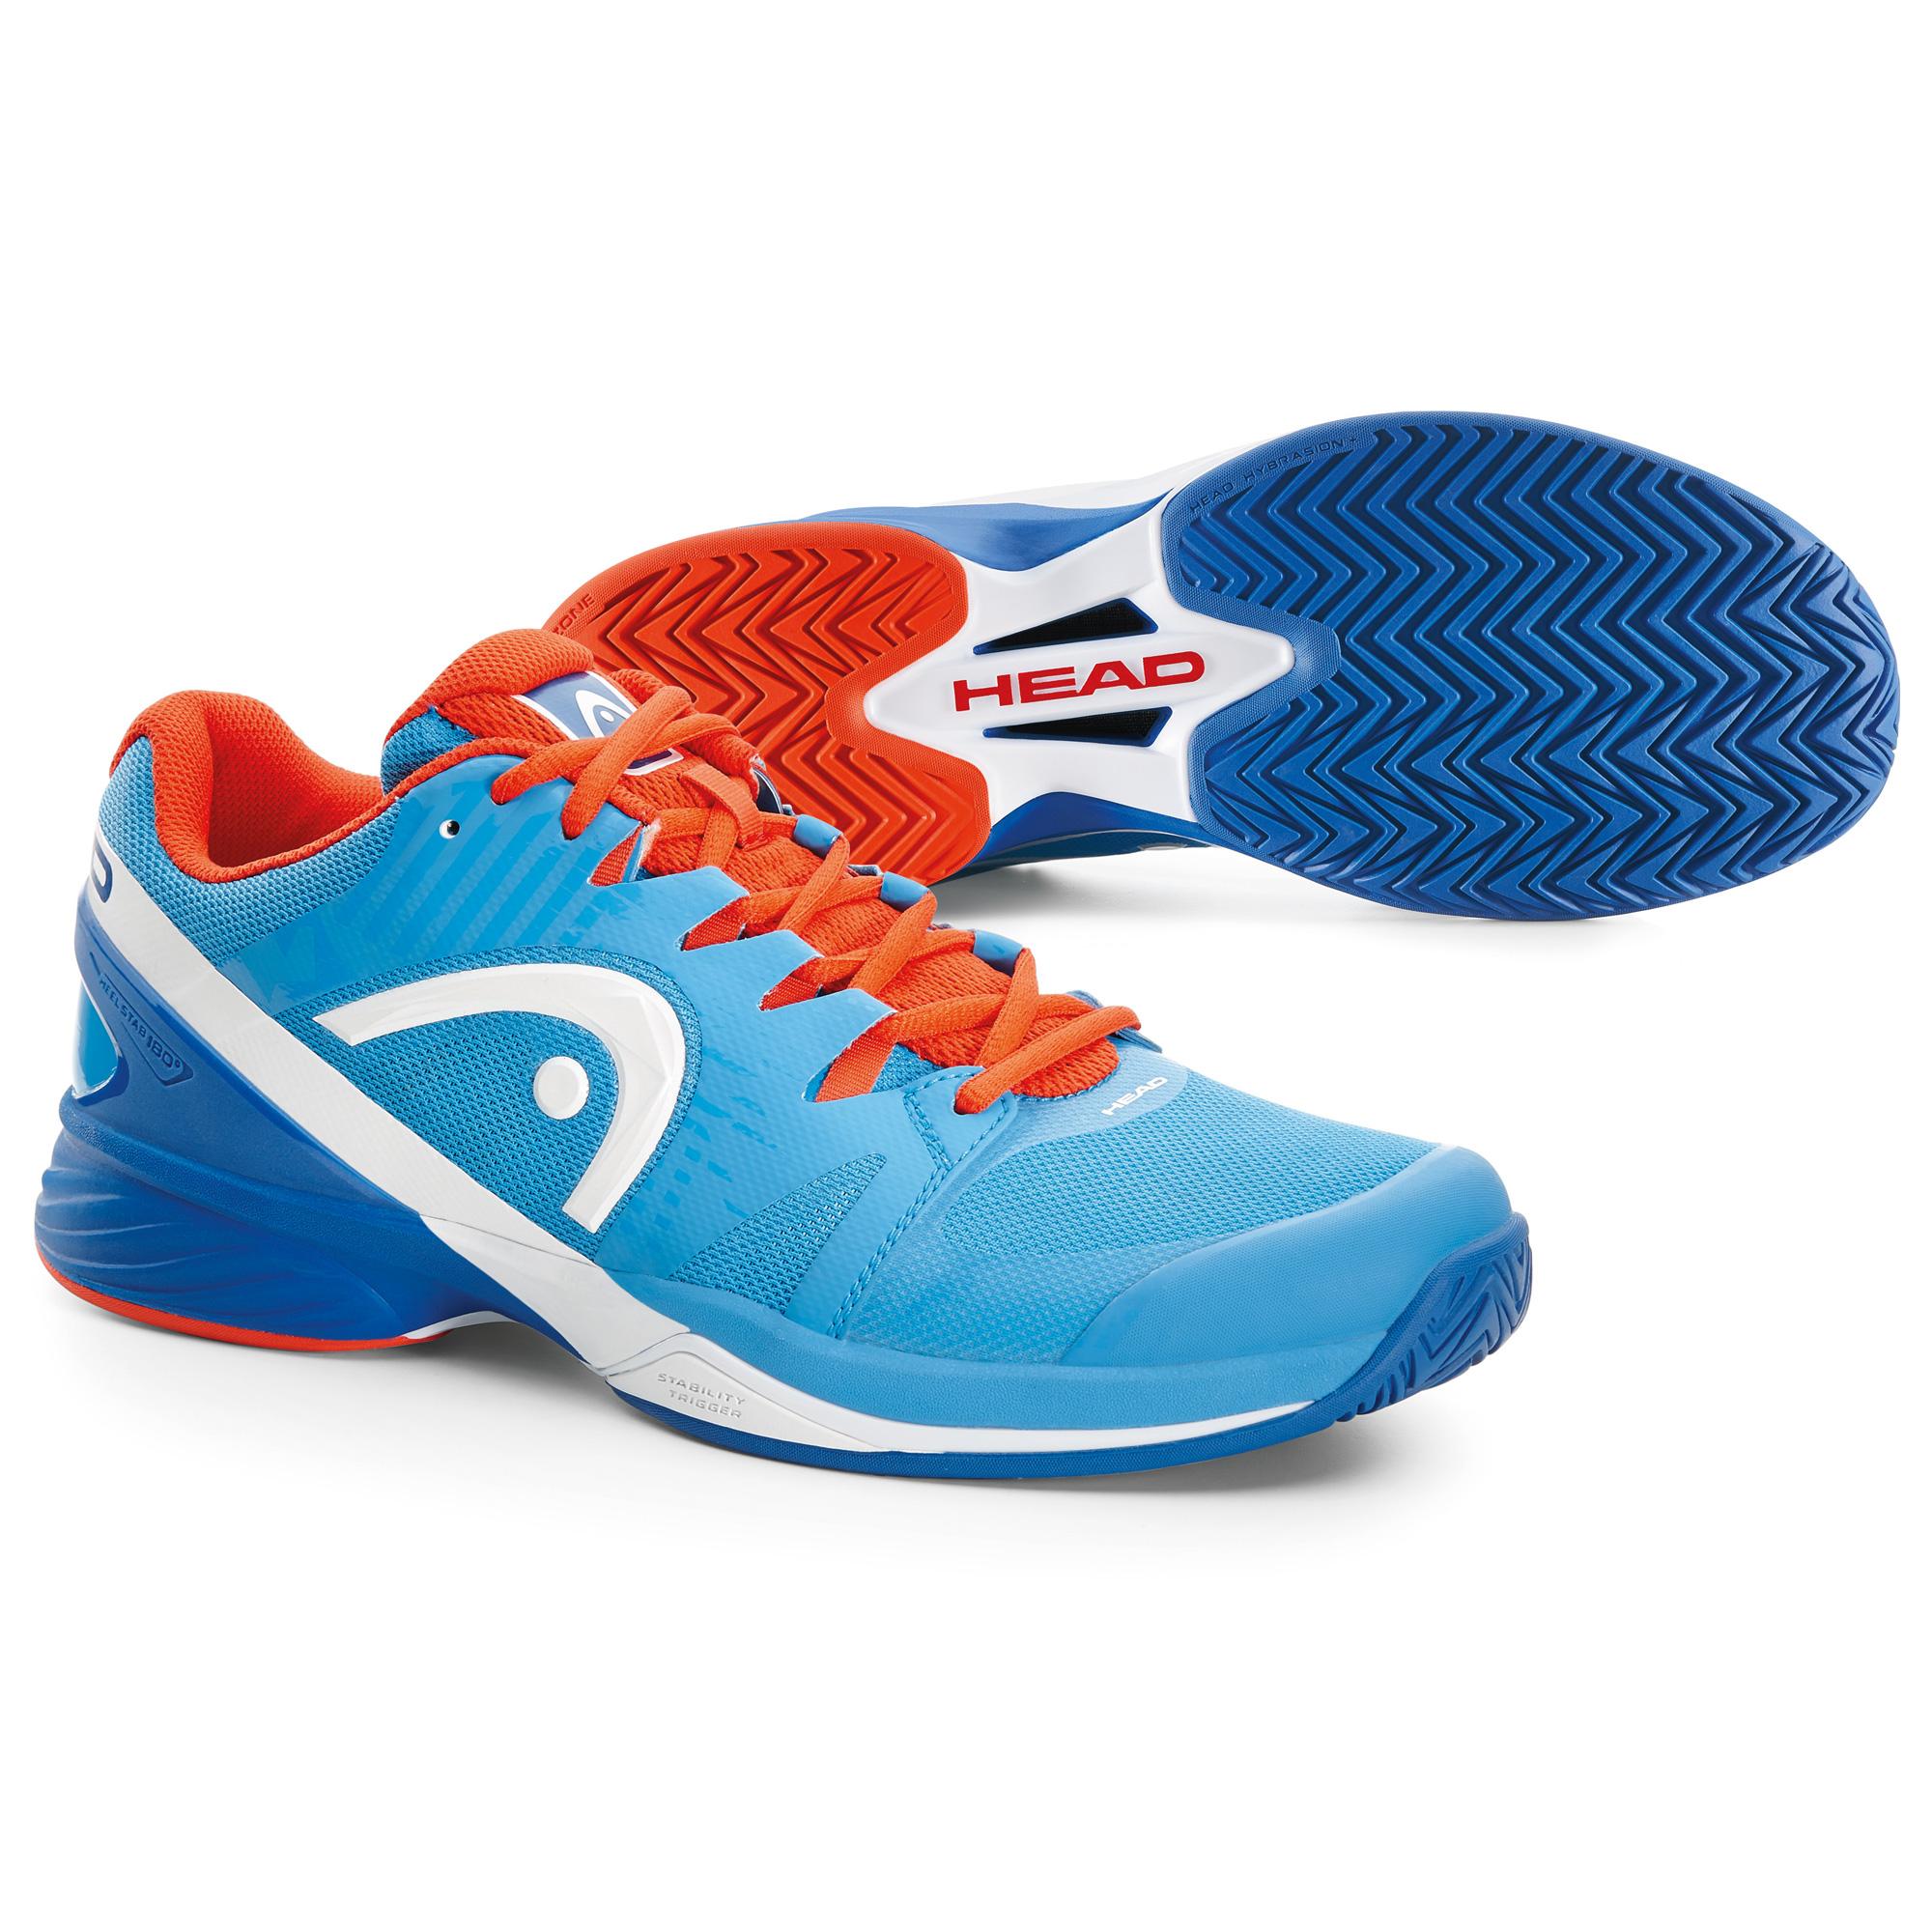 Good deals on mens tennis shoes